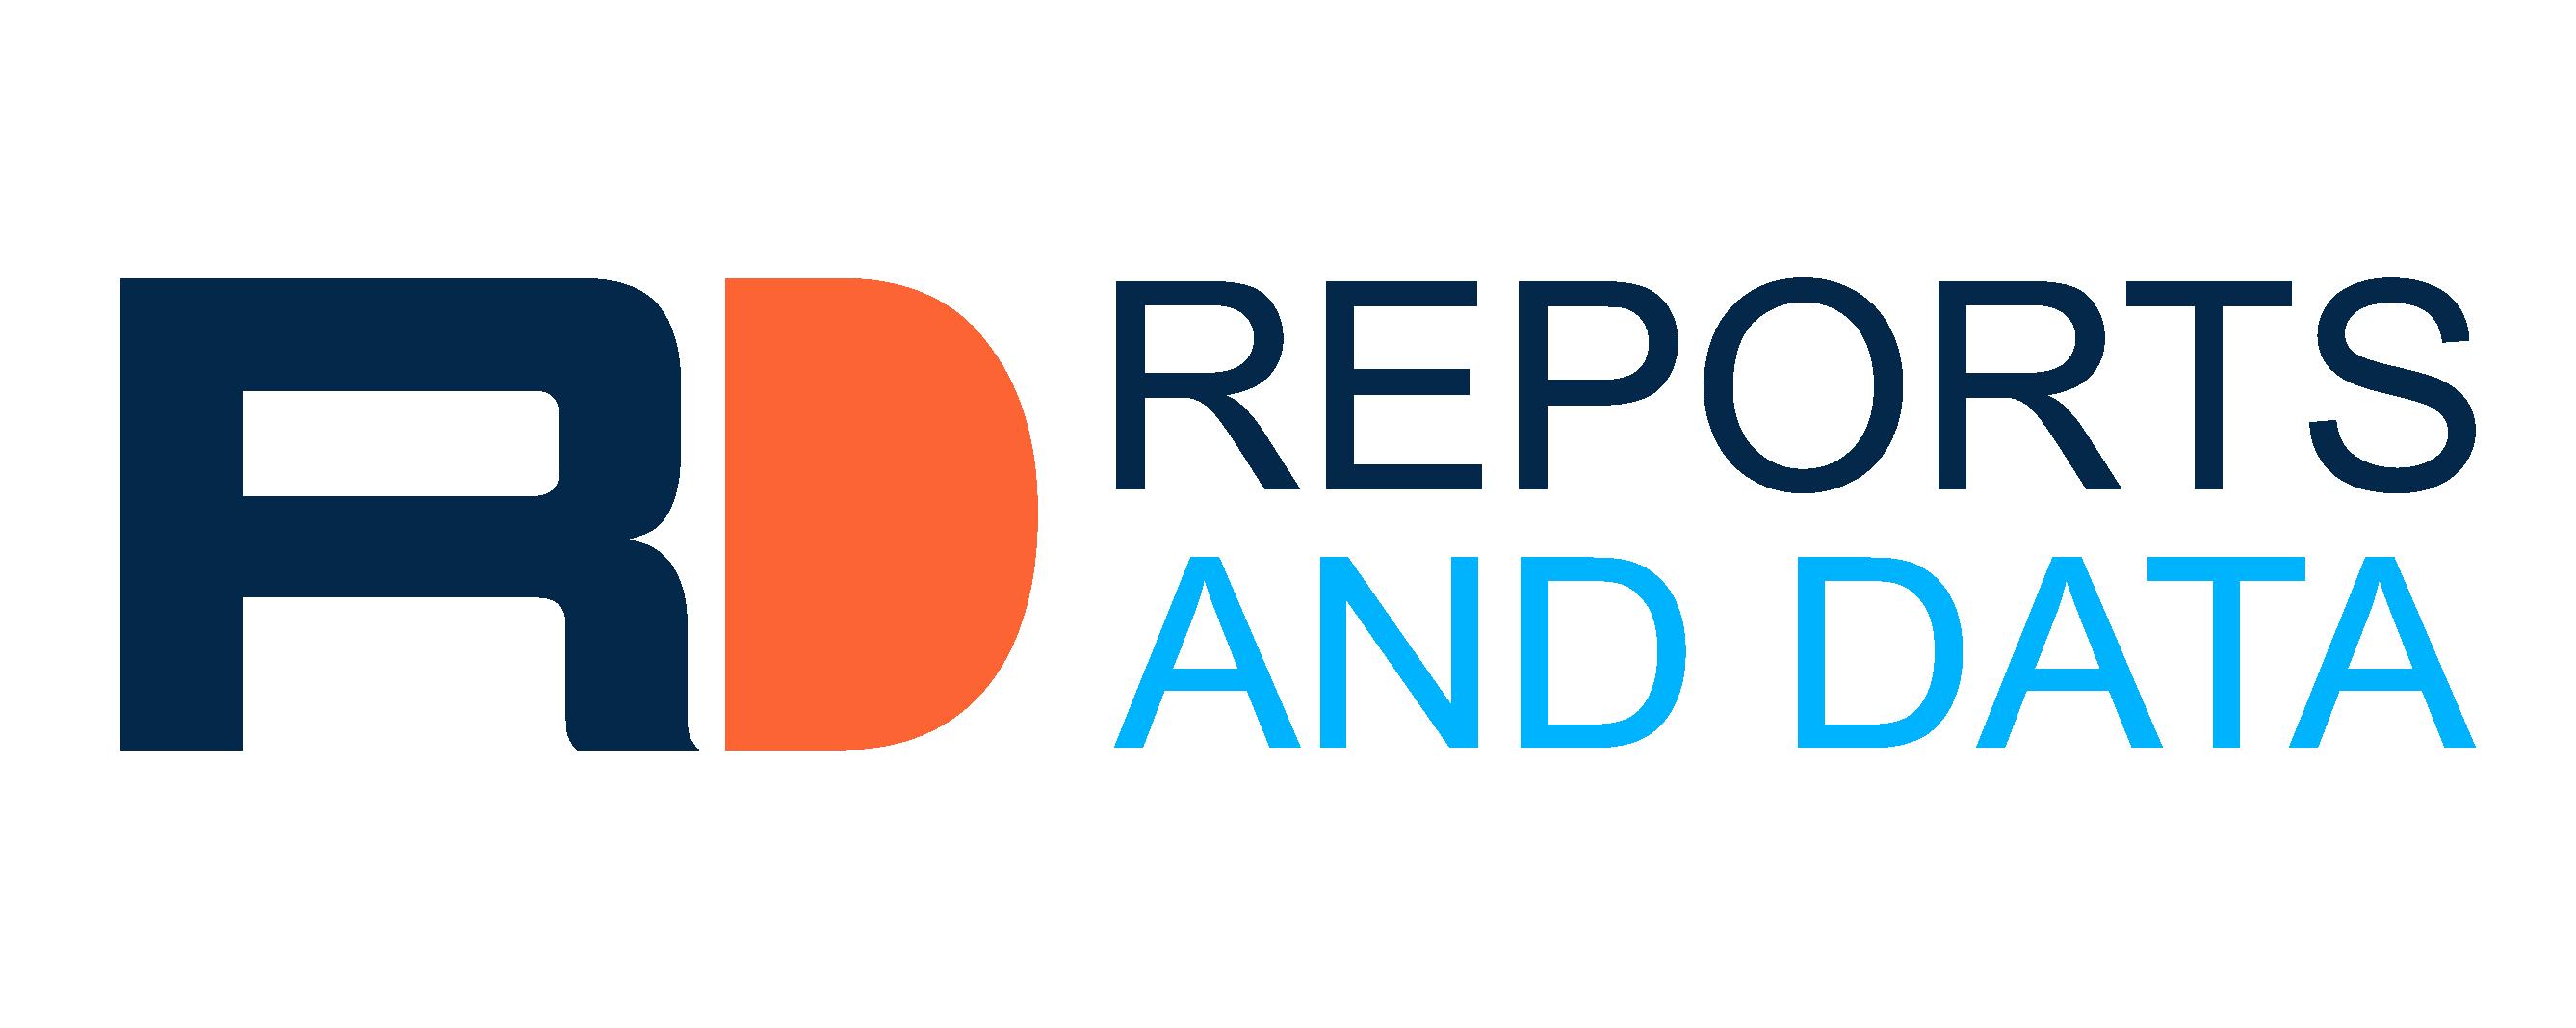 Online Investment Platform Market Revenue & Demand Analysis (2019-2026): Top Key Players - Accenture, Murex, Fiserv, Inc., Temenos AG, InvestEdge, Inc.